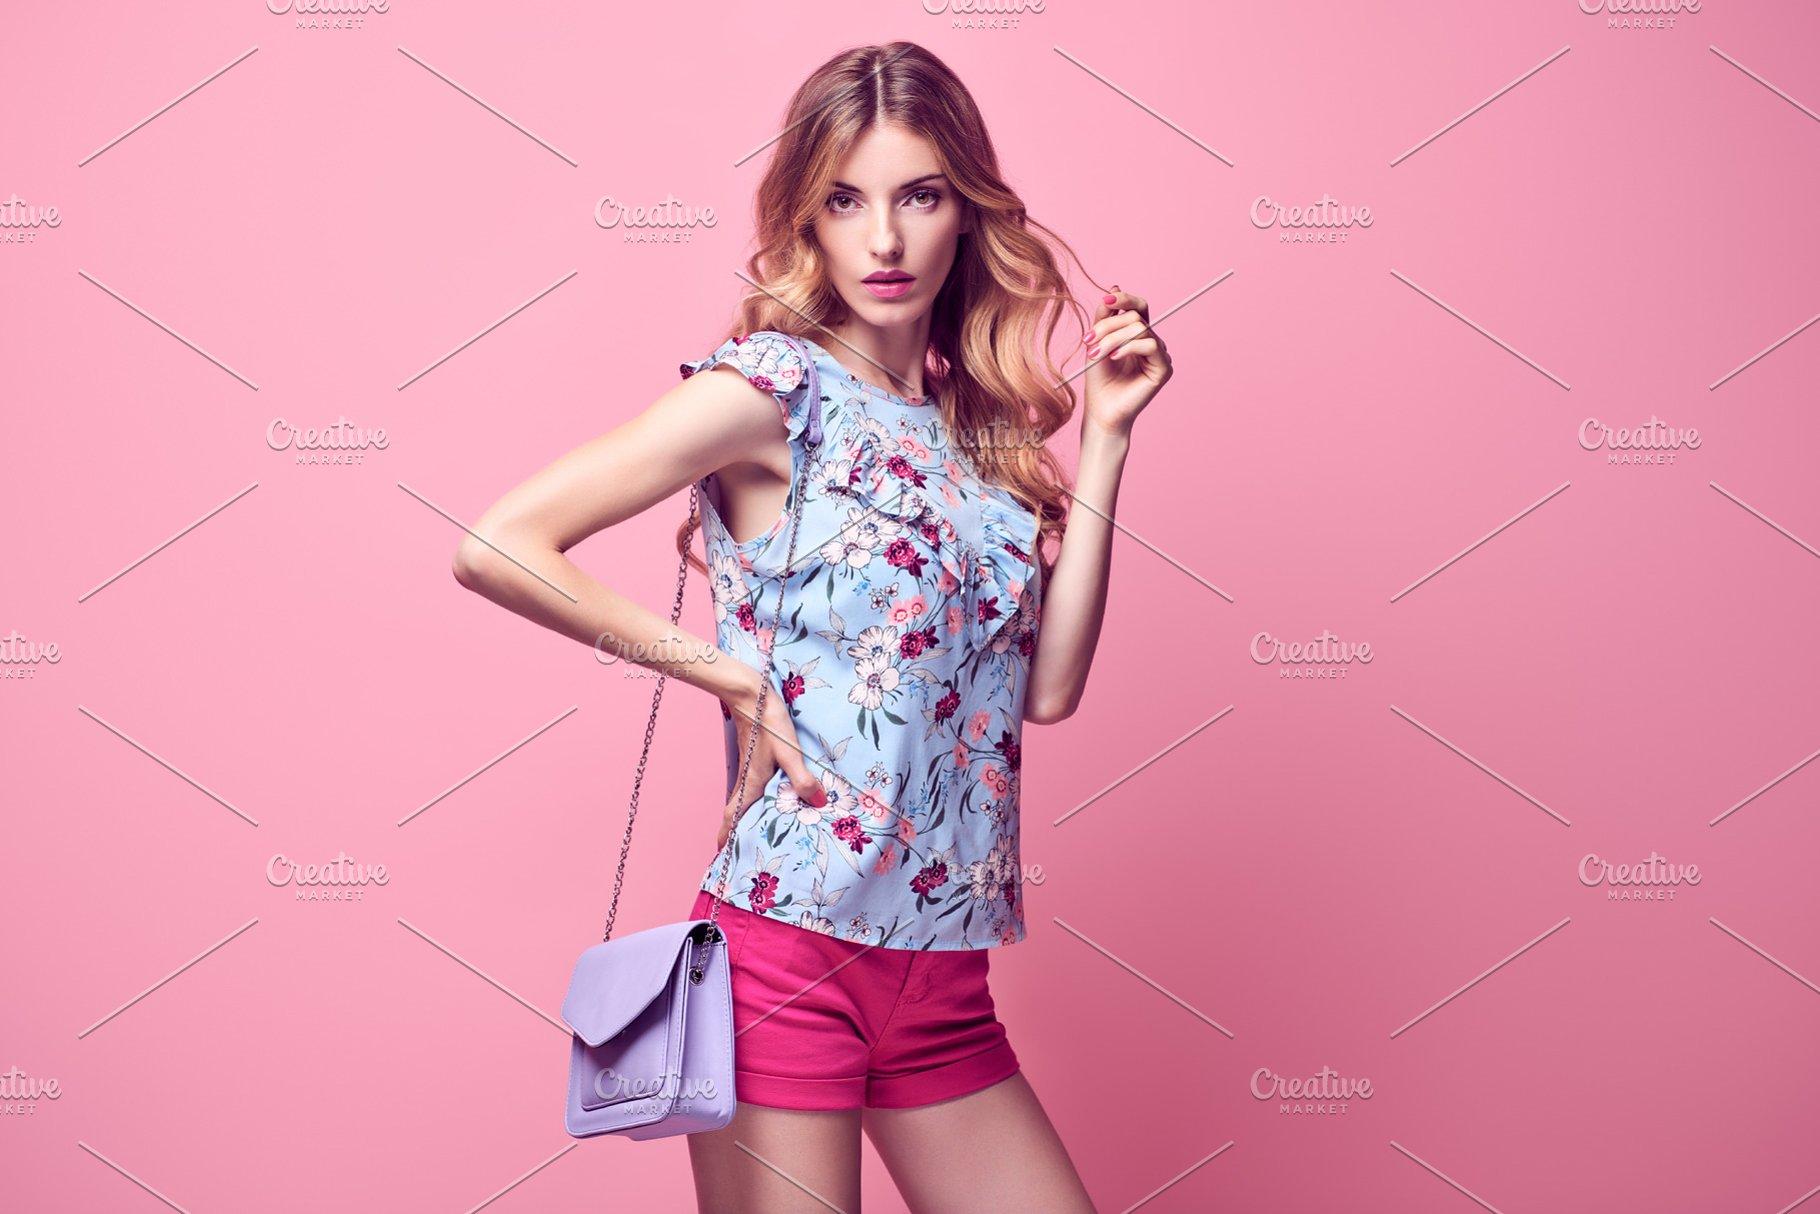 82068f180 Sensual Blonde model woman ~ Beauty   Fashion Photos ~ Creative Market